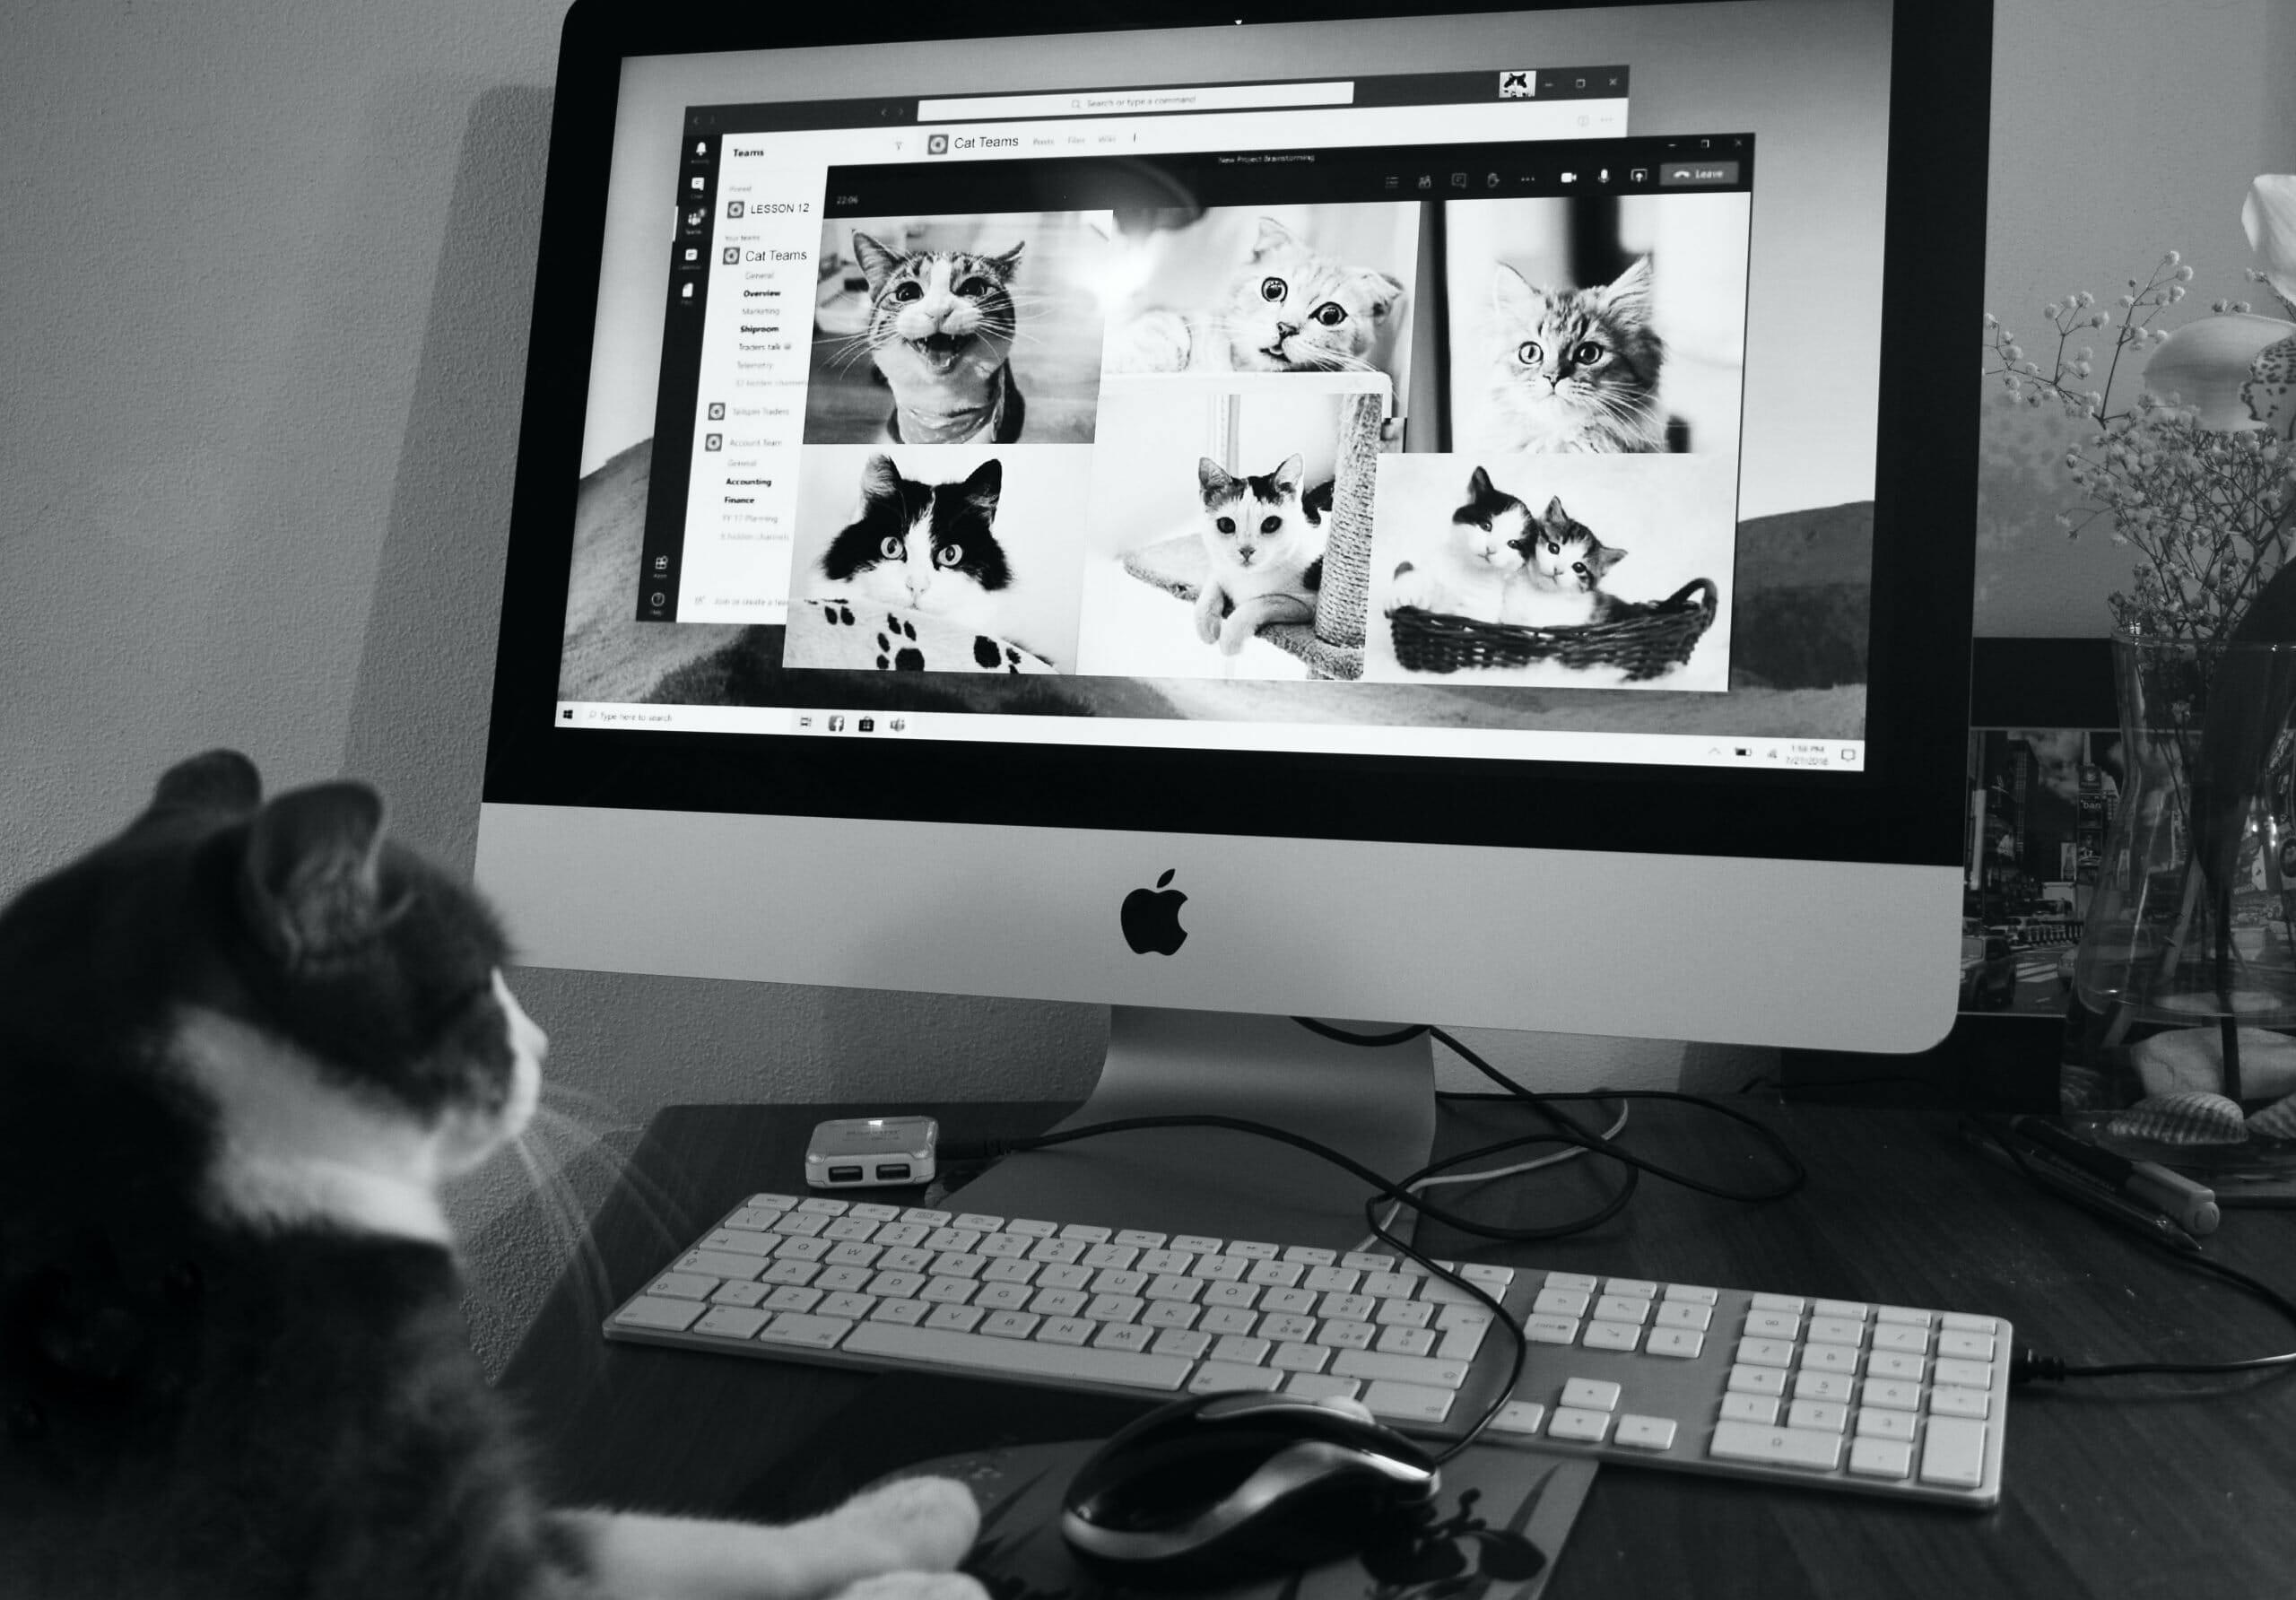 Cats googling Cats - meet our new digital marketing apprentice, Cat Grimshaw - Cameo Digital